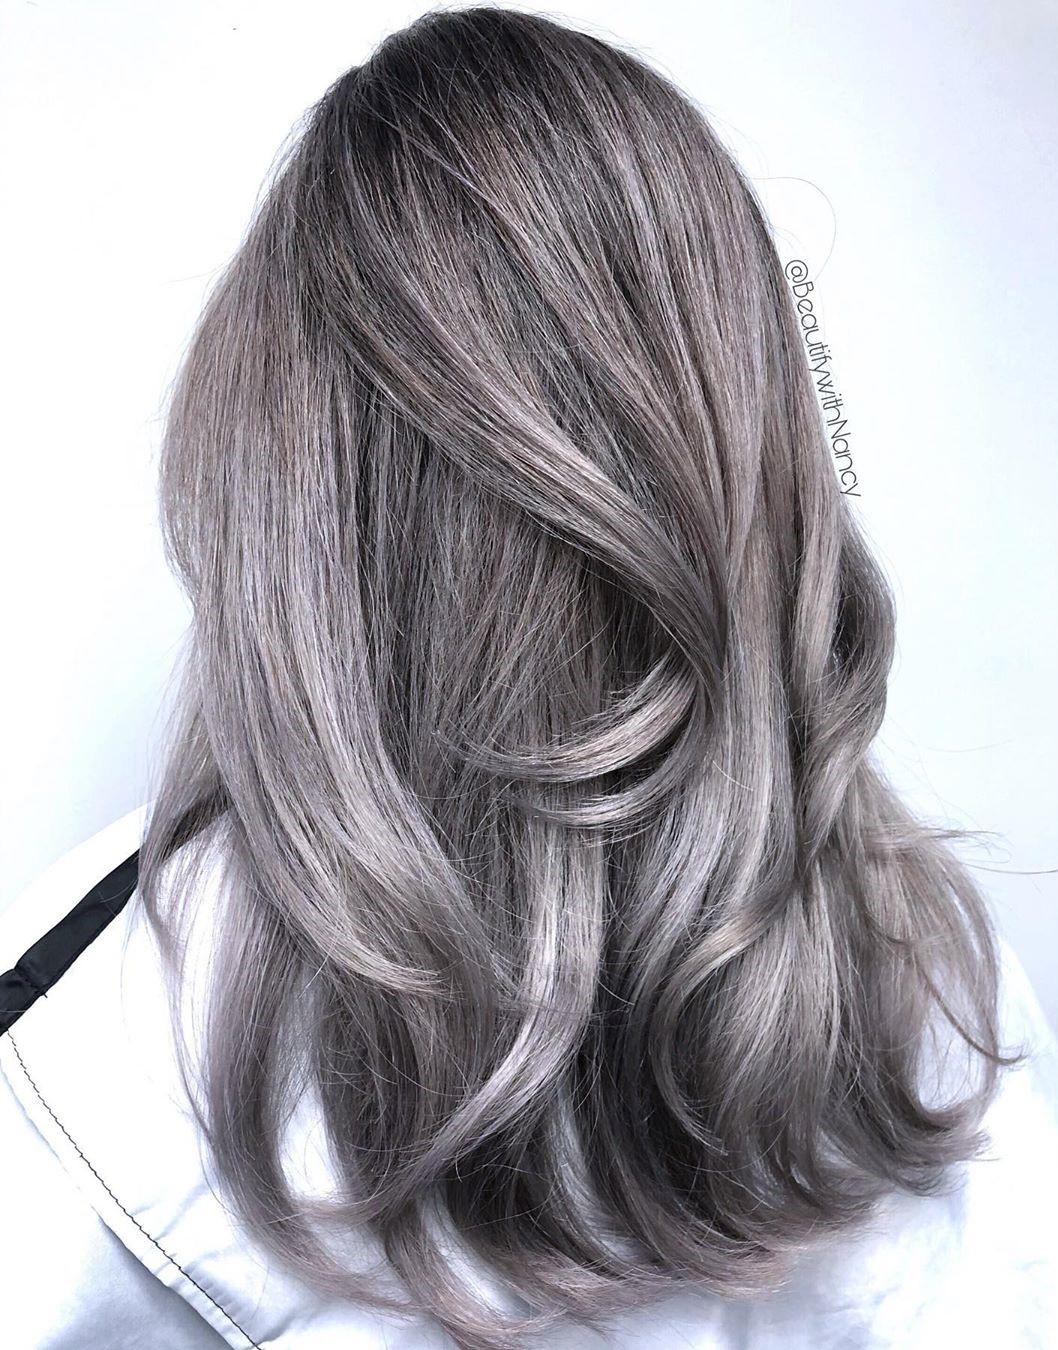 Dark Smokey Silver Hairstyle